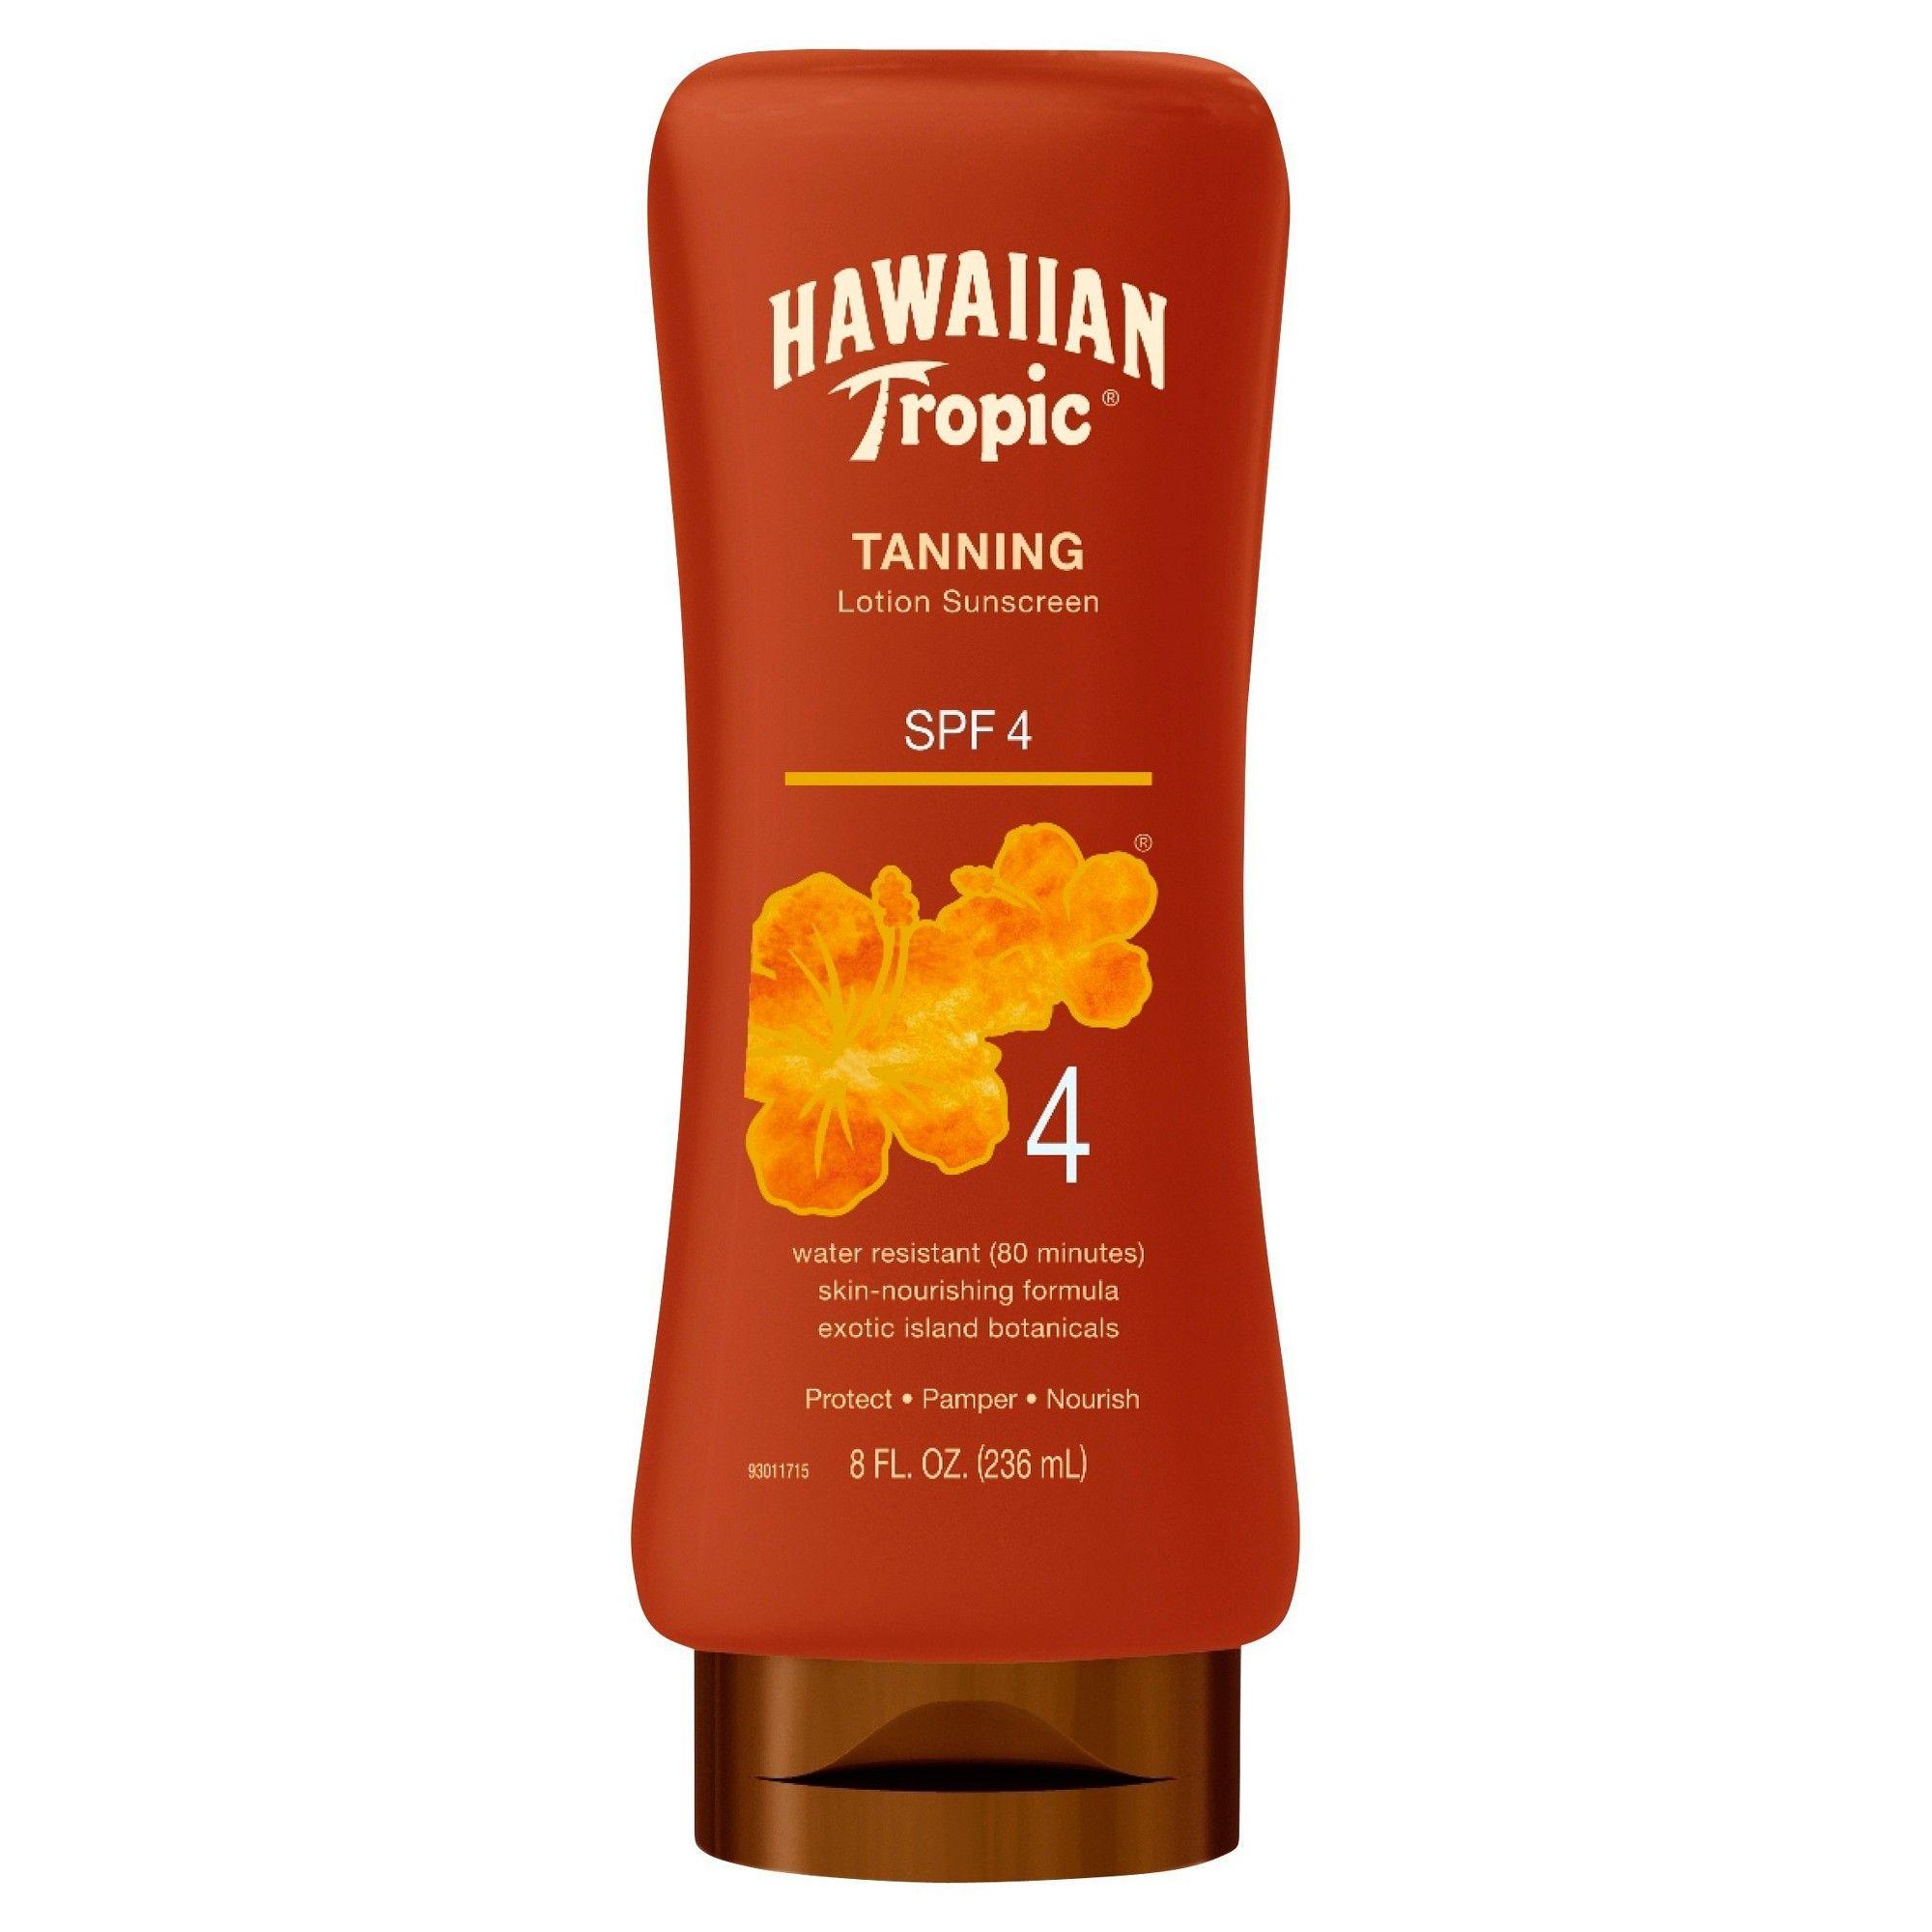 Hawaiian Tropic Dark Tanning Lotion Sunscreen SPF 4